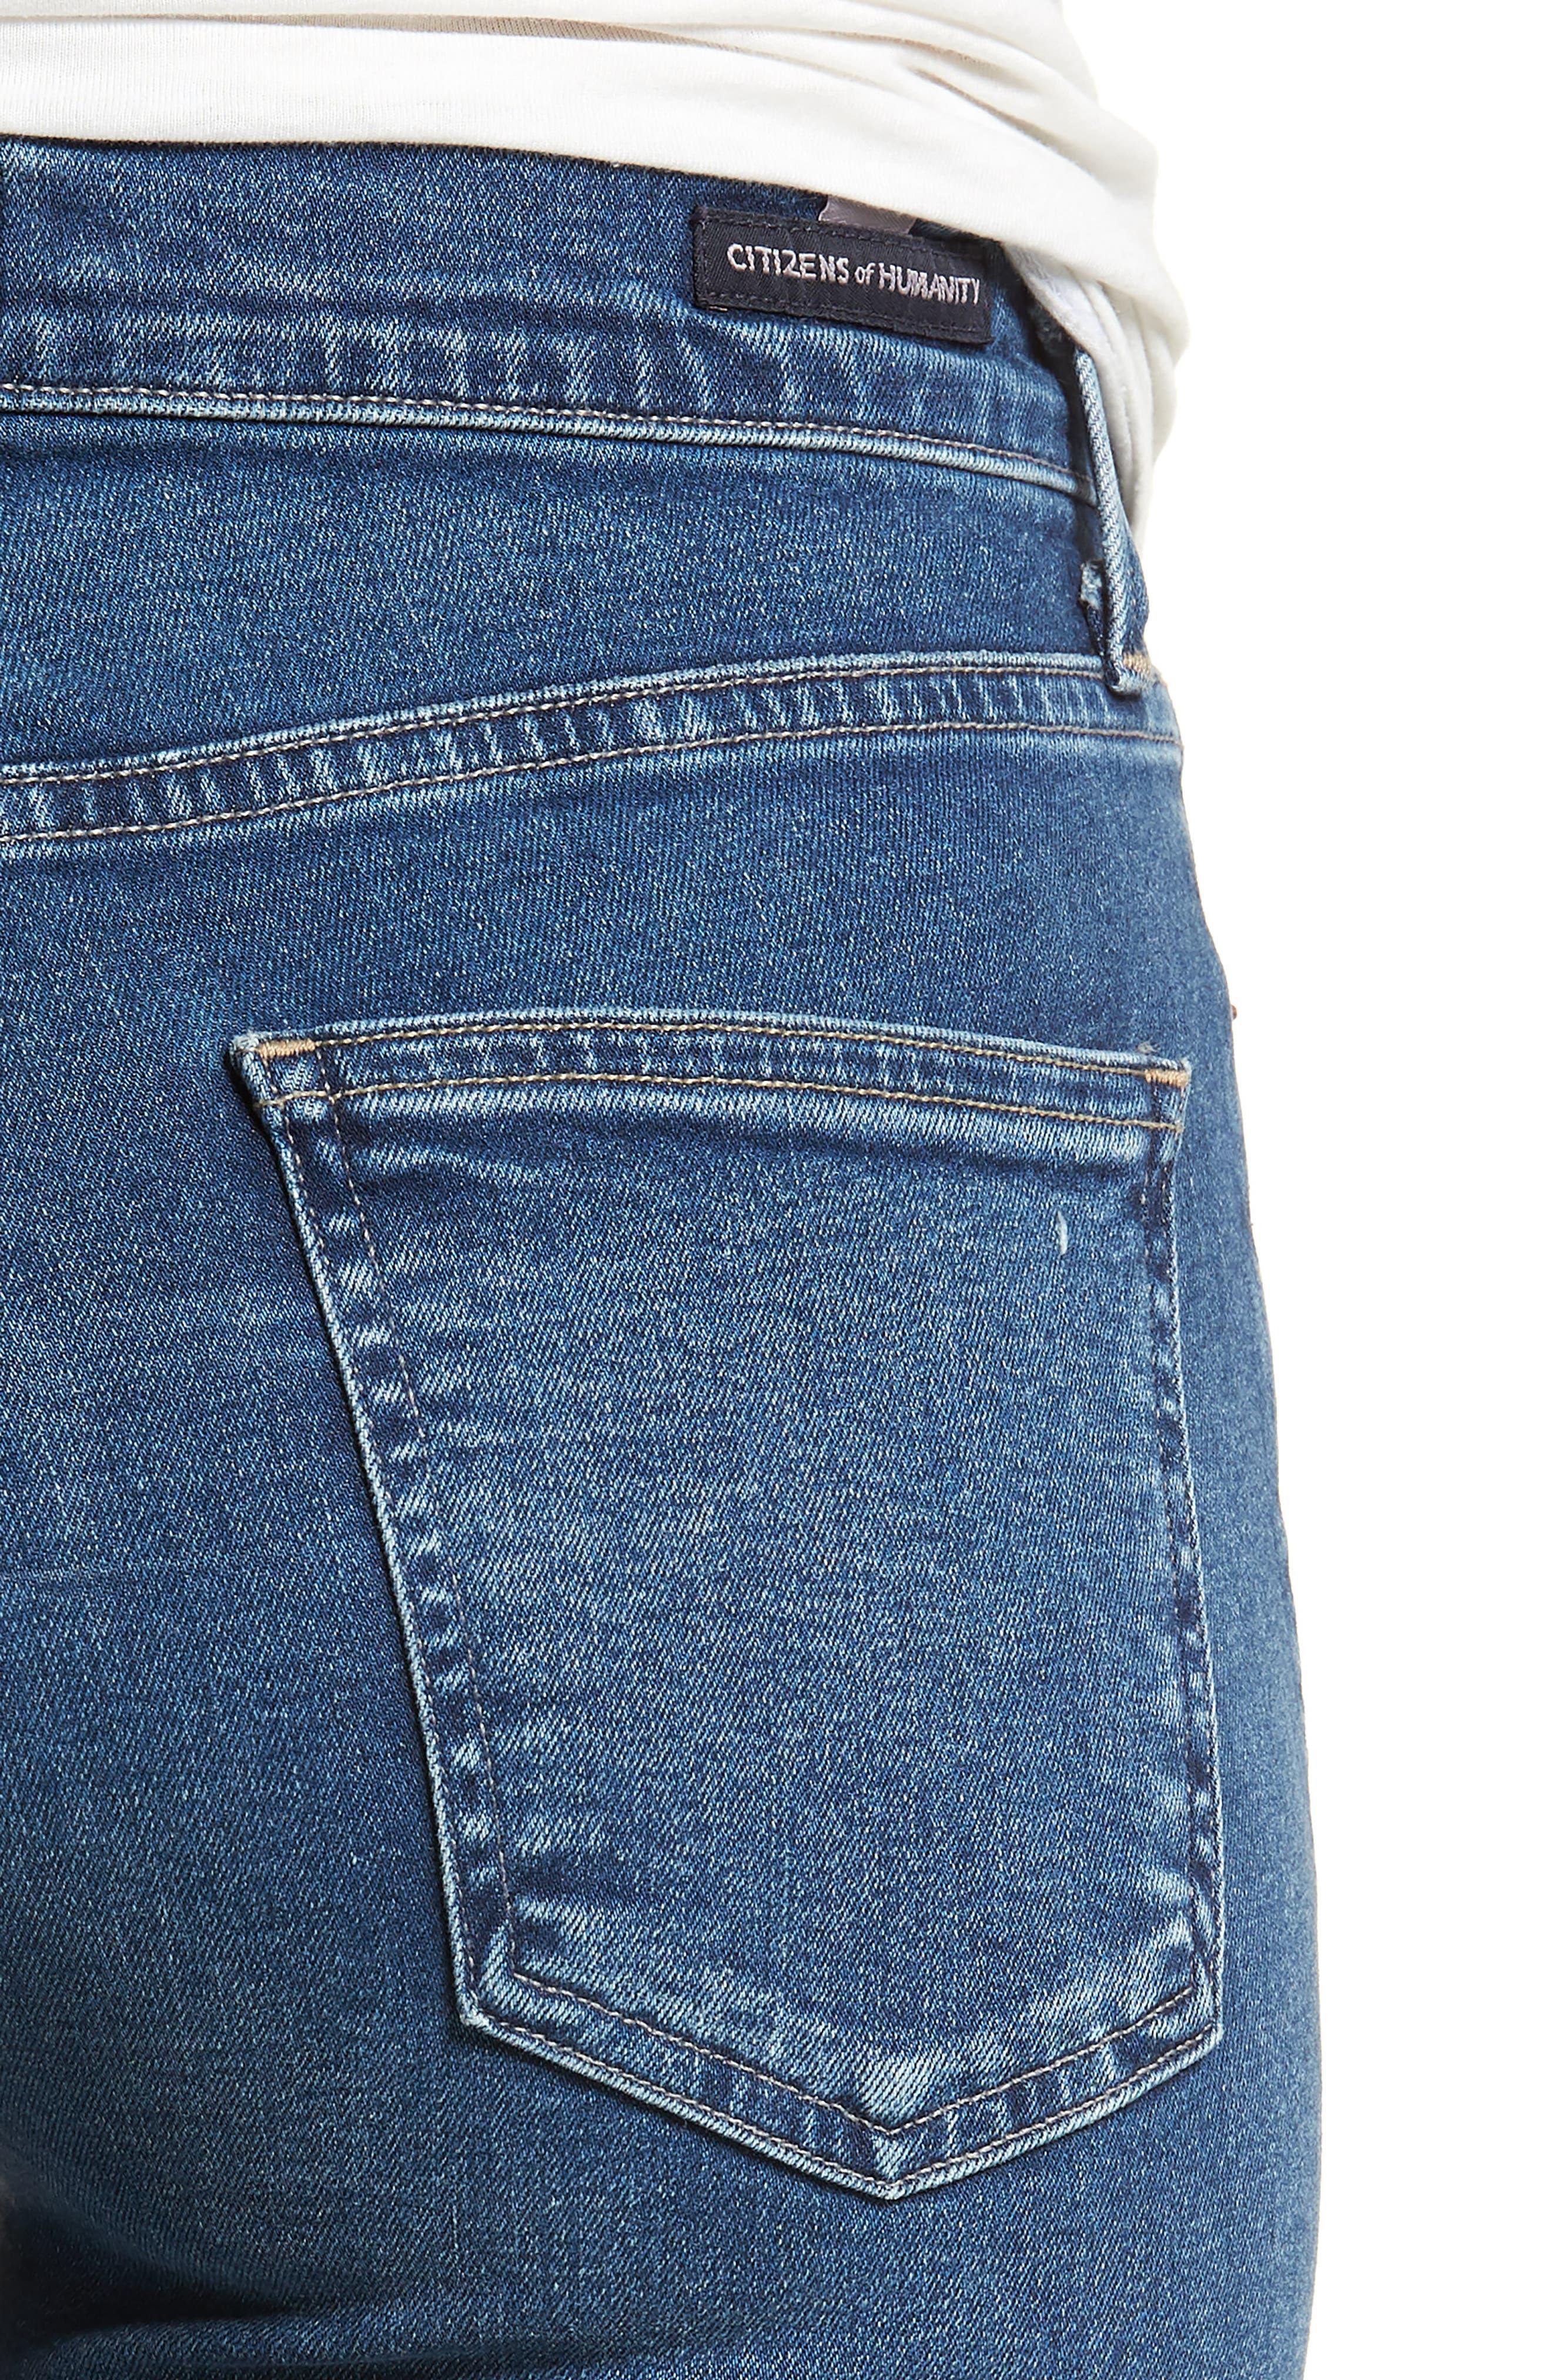 Cara Ankle Cigarette Jeans,                             Alternate thumbnail 4, color,